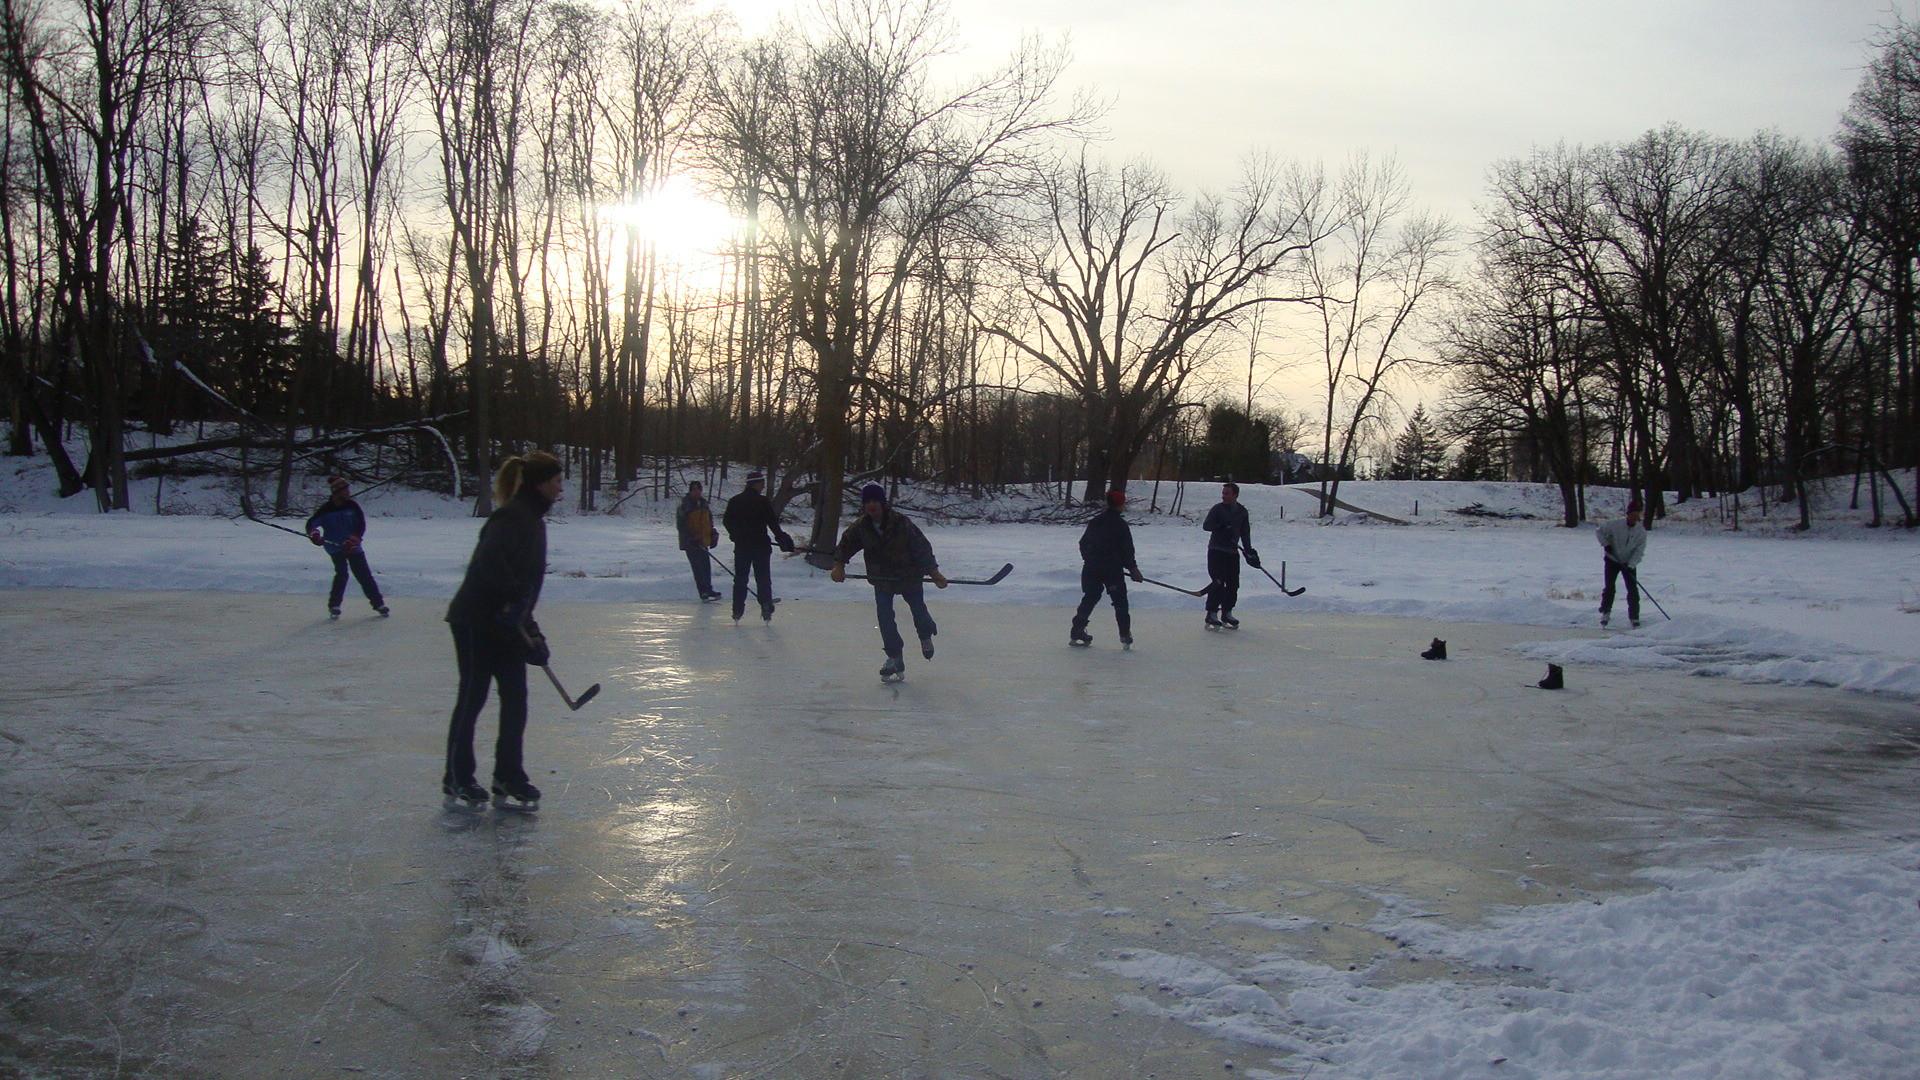 Pond hockey in my backyard